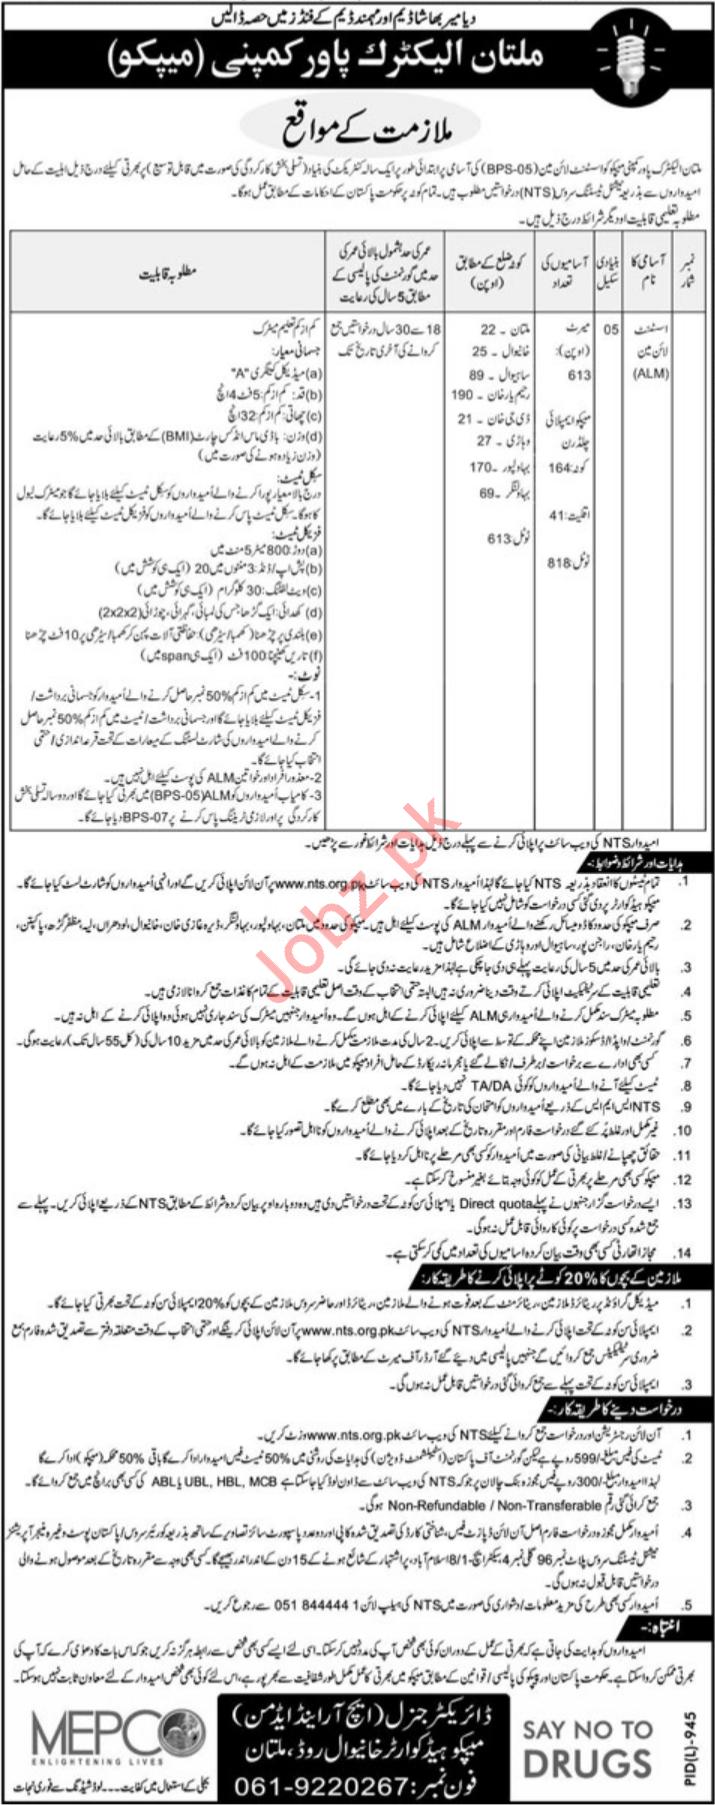 Multan Electric Power Company MEPCO Jobs Through NTS